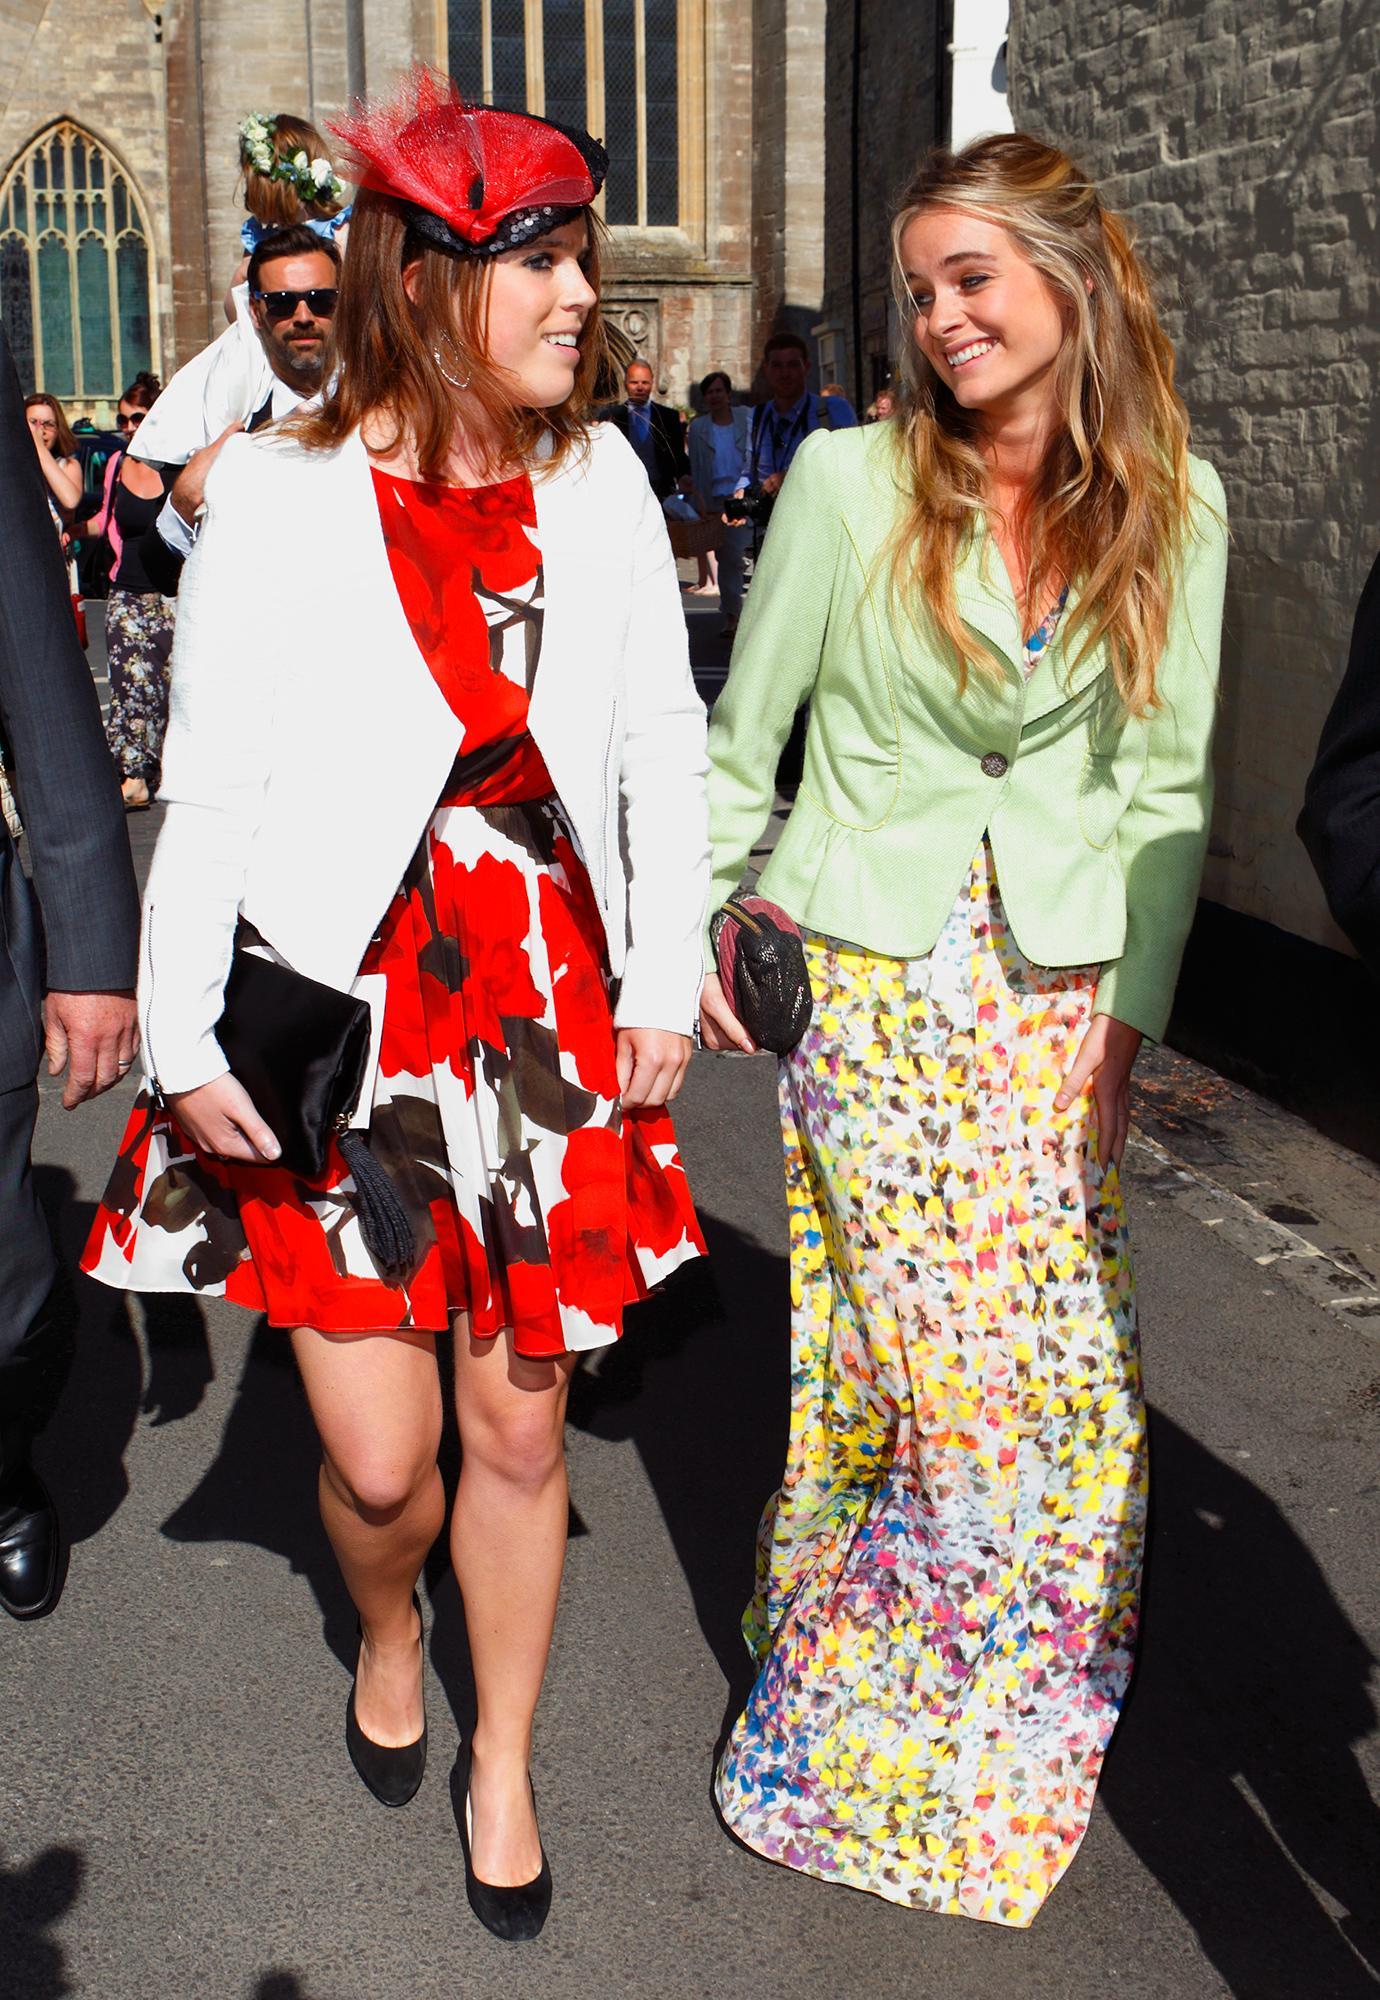 .@Cressida_Bonas's style pre and post Prince Harry: http://t.co/trljNatQ6O http://t.co/YrB0d2aZy1